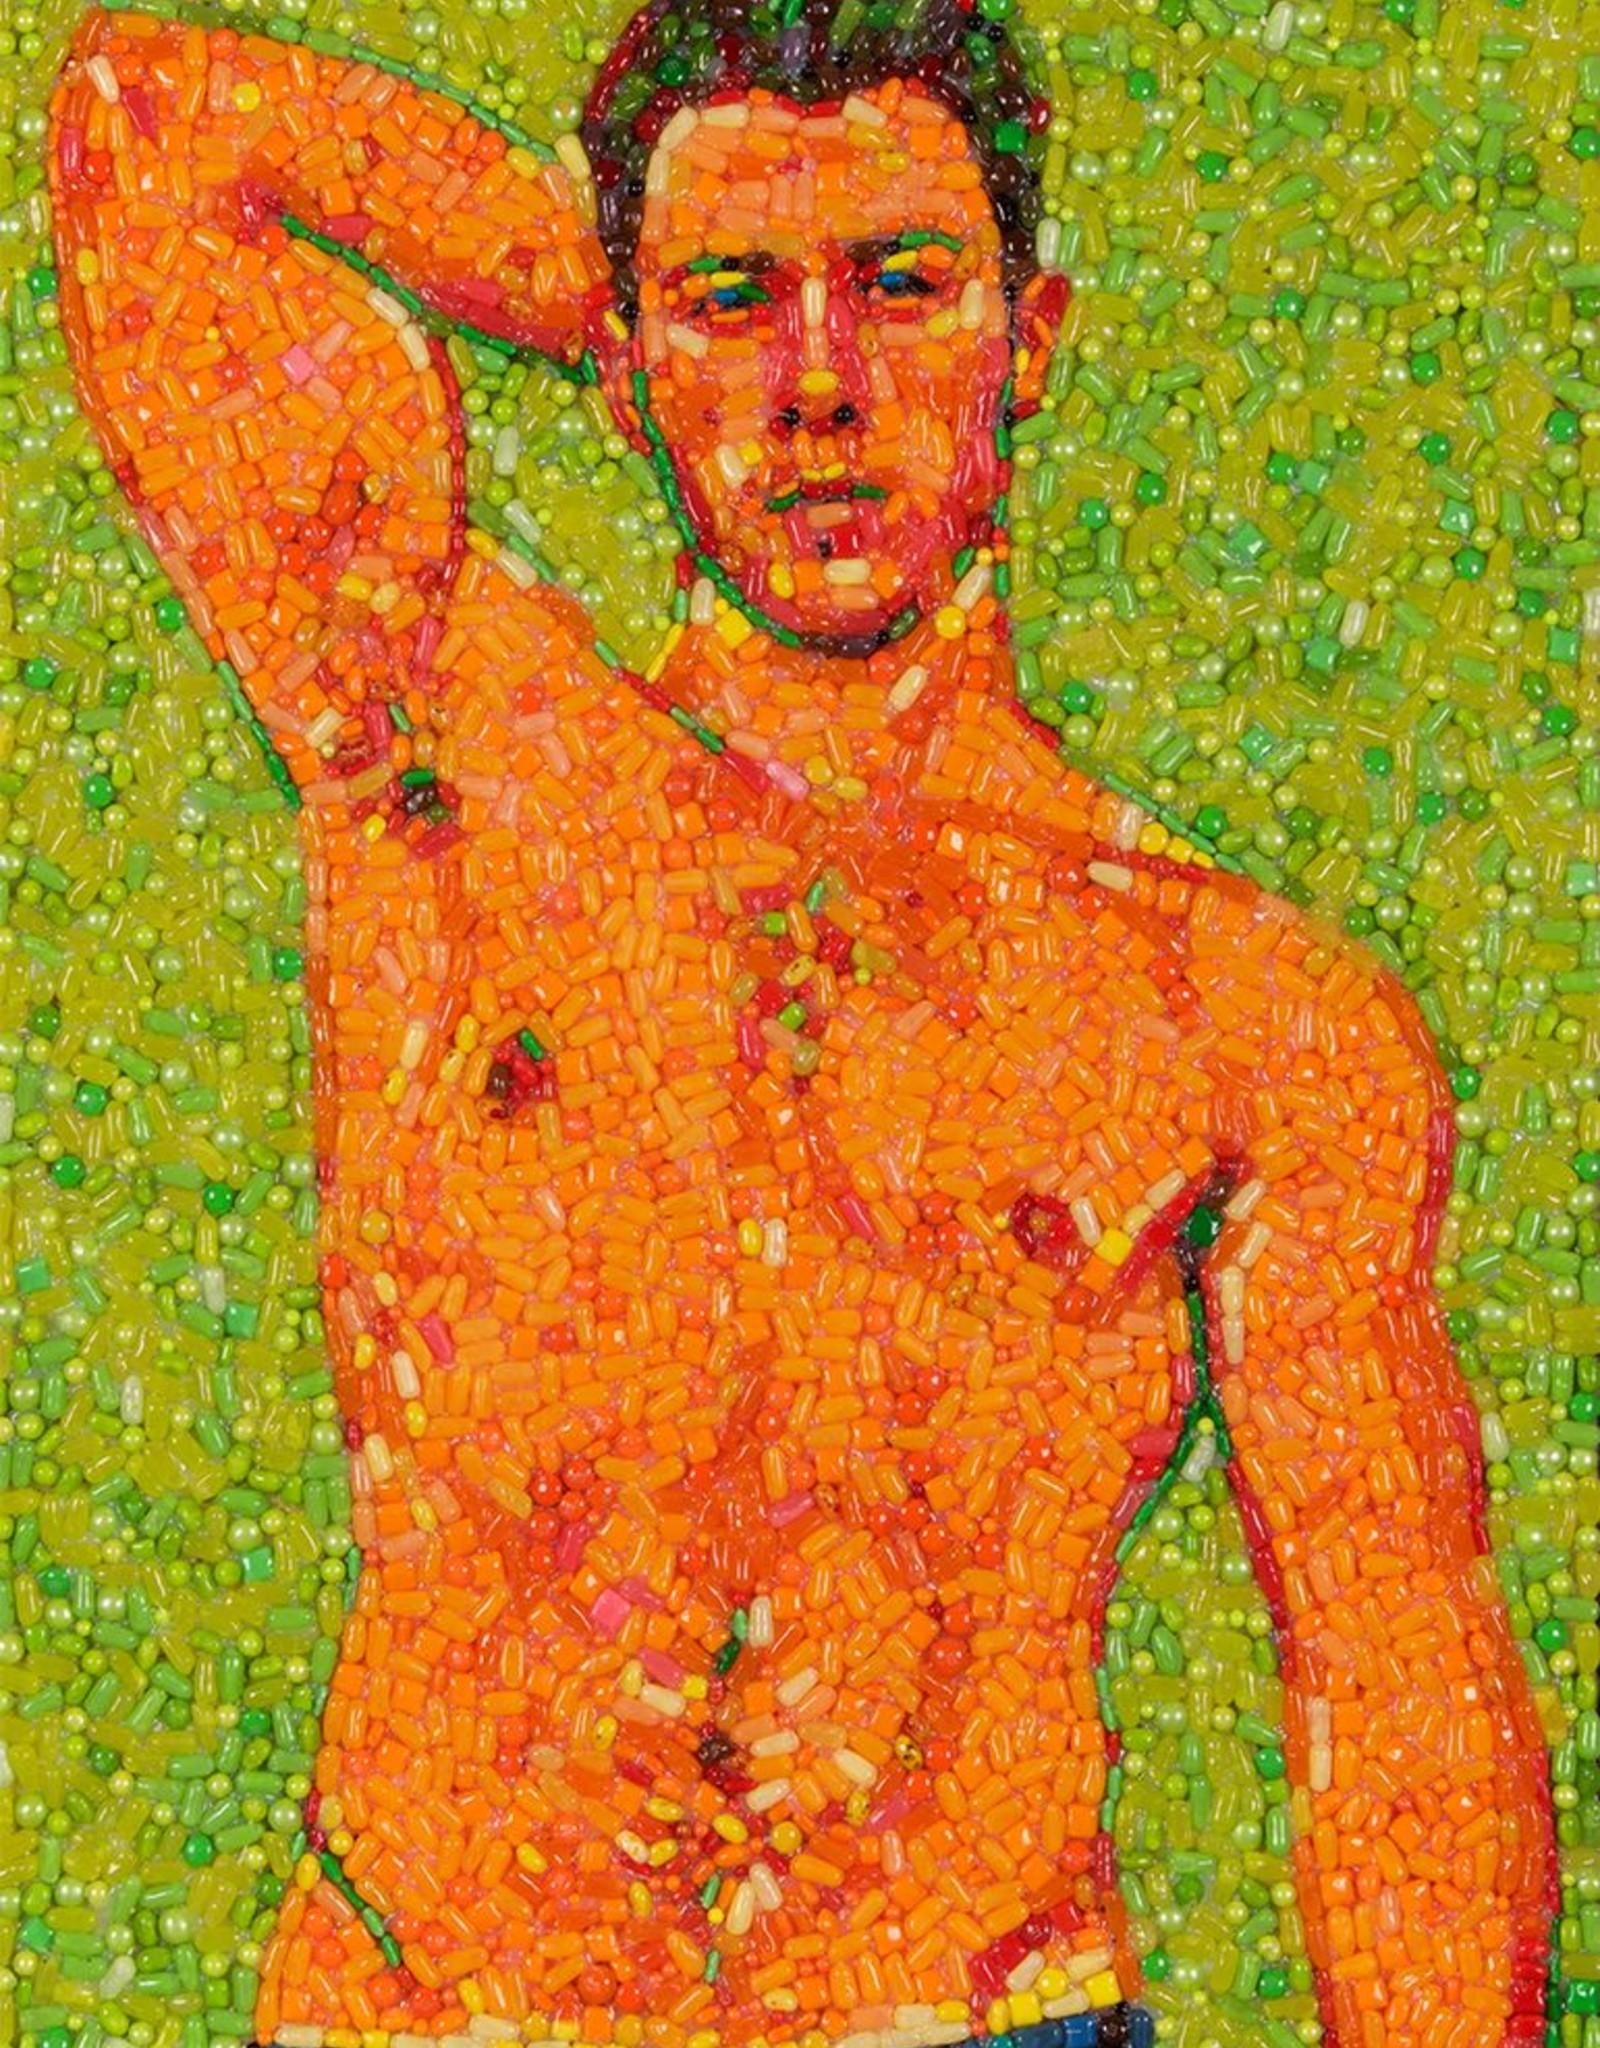 Candylebrity Art (24x36) - Nick Jonas